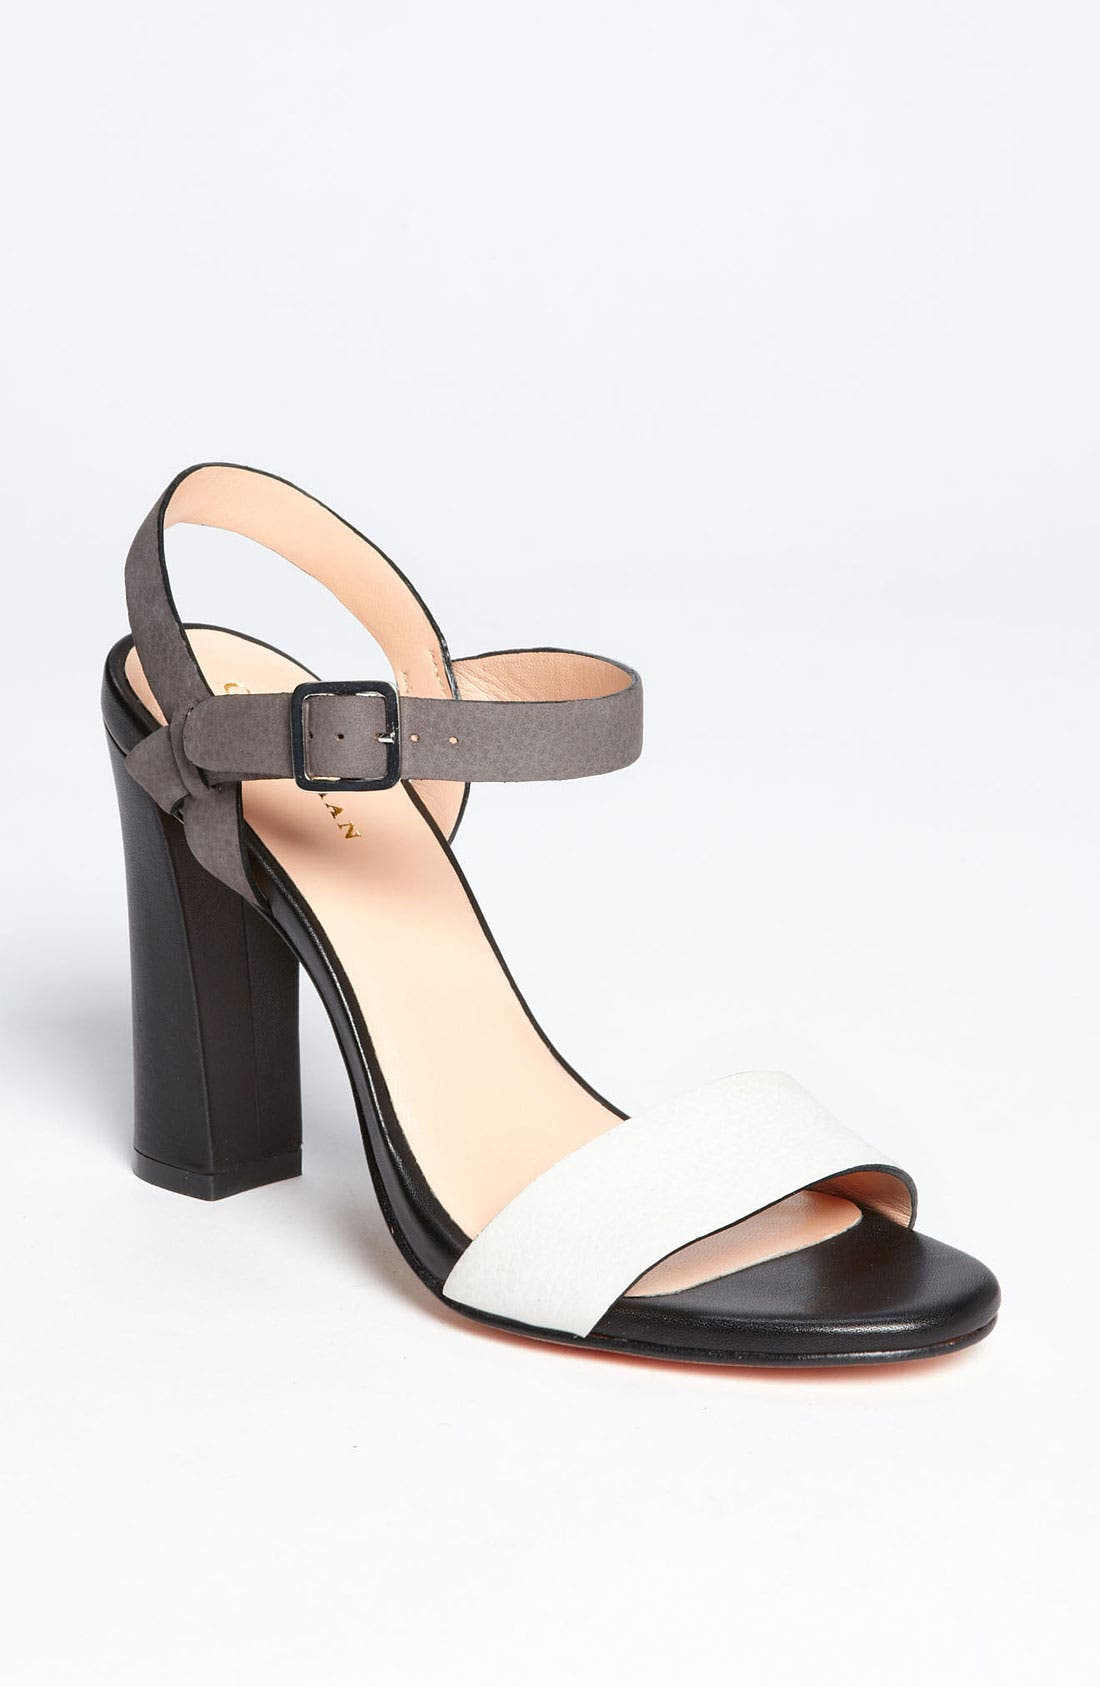 COLE HAAN,                             'Minetta' Sandal,                             Main thumbnail 1, color,                             020